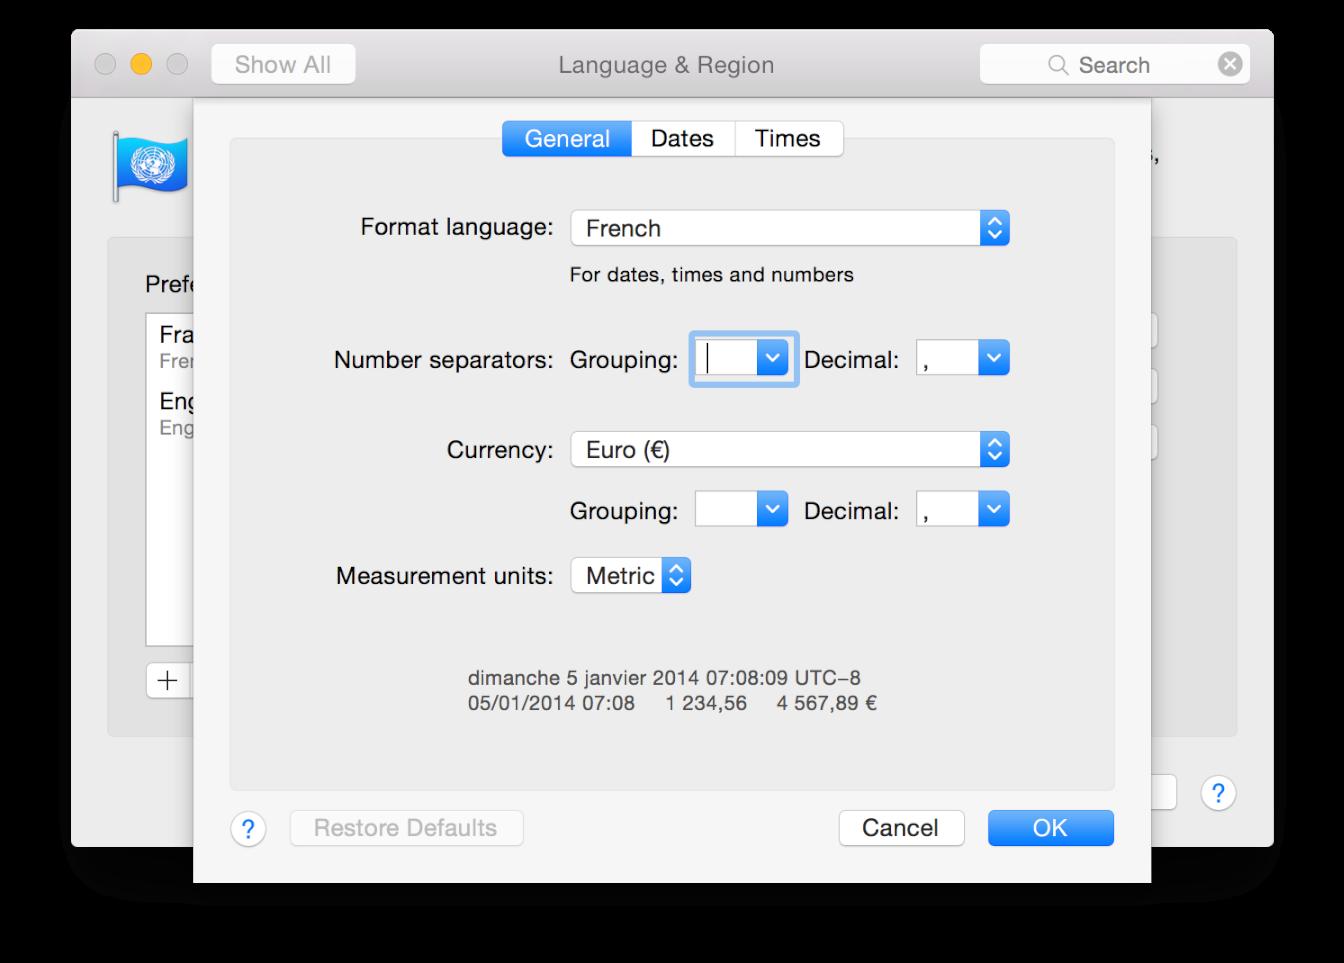 92174cbe1a5 Art/mac_language_region_settings_general_2x.png .